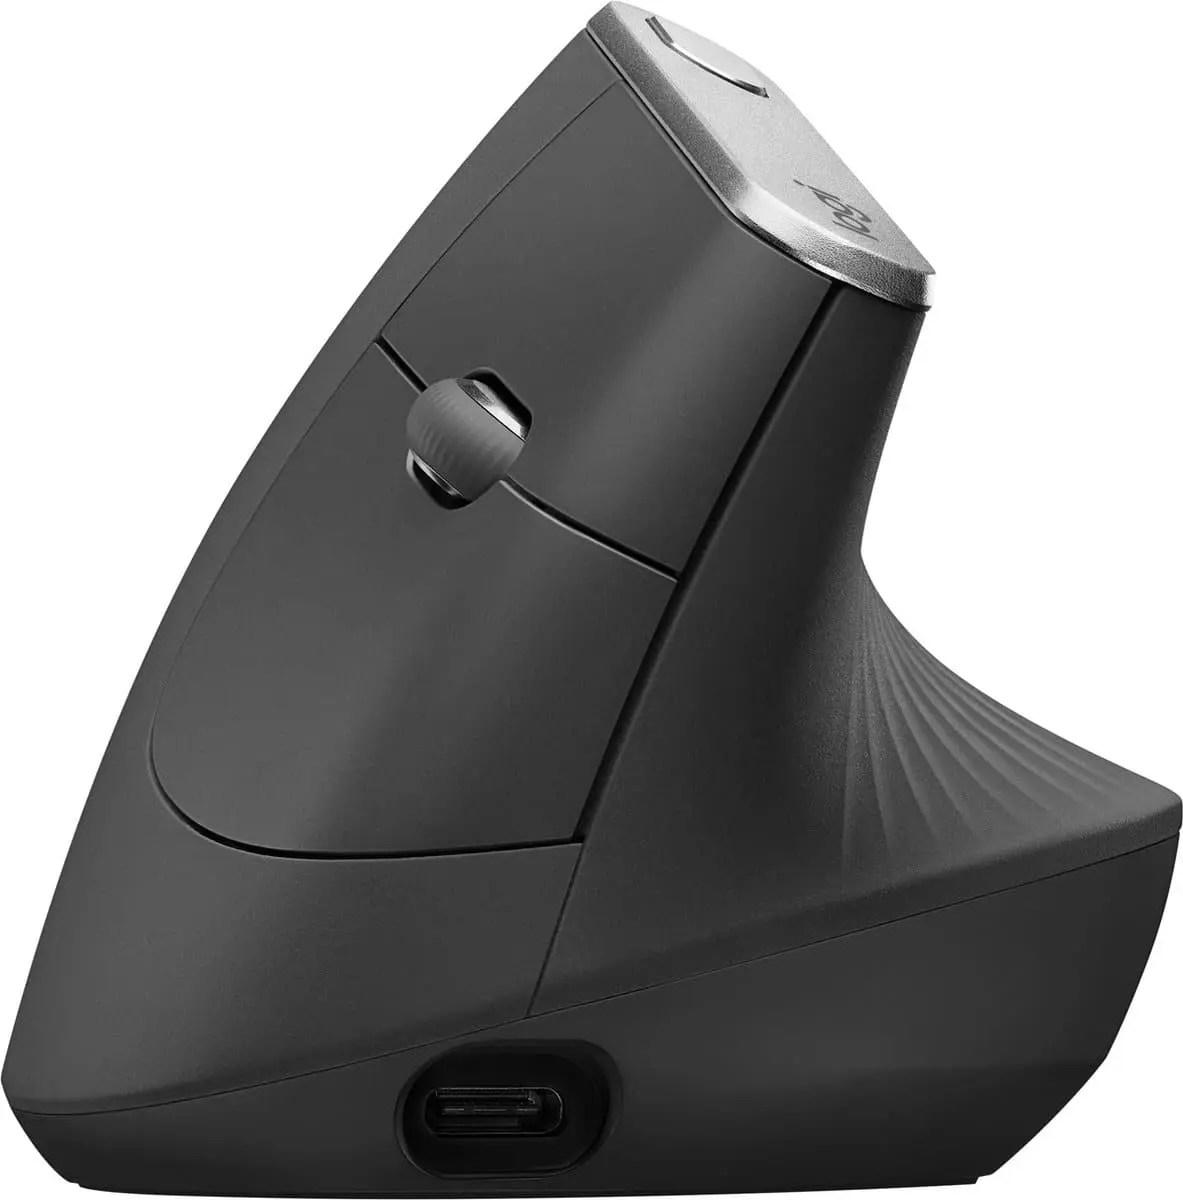 Logitech MX Vertical Draadloze Ergonomische Muis